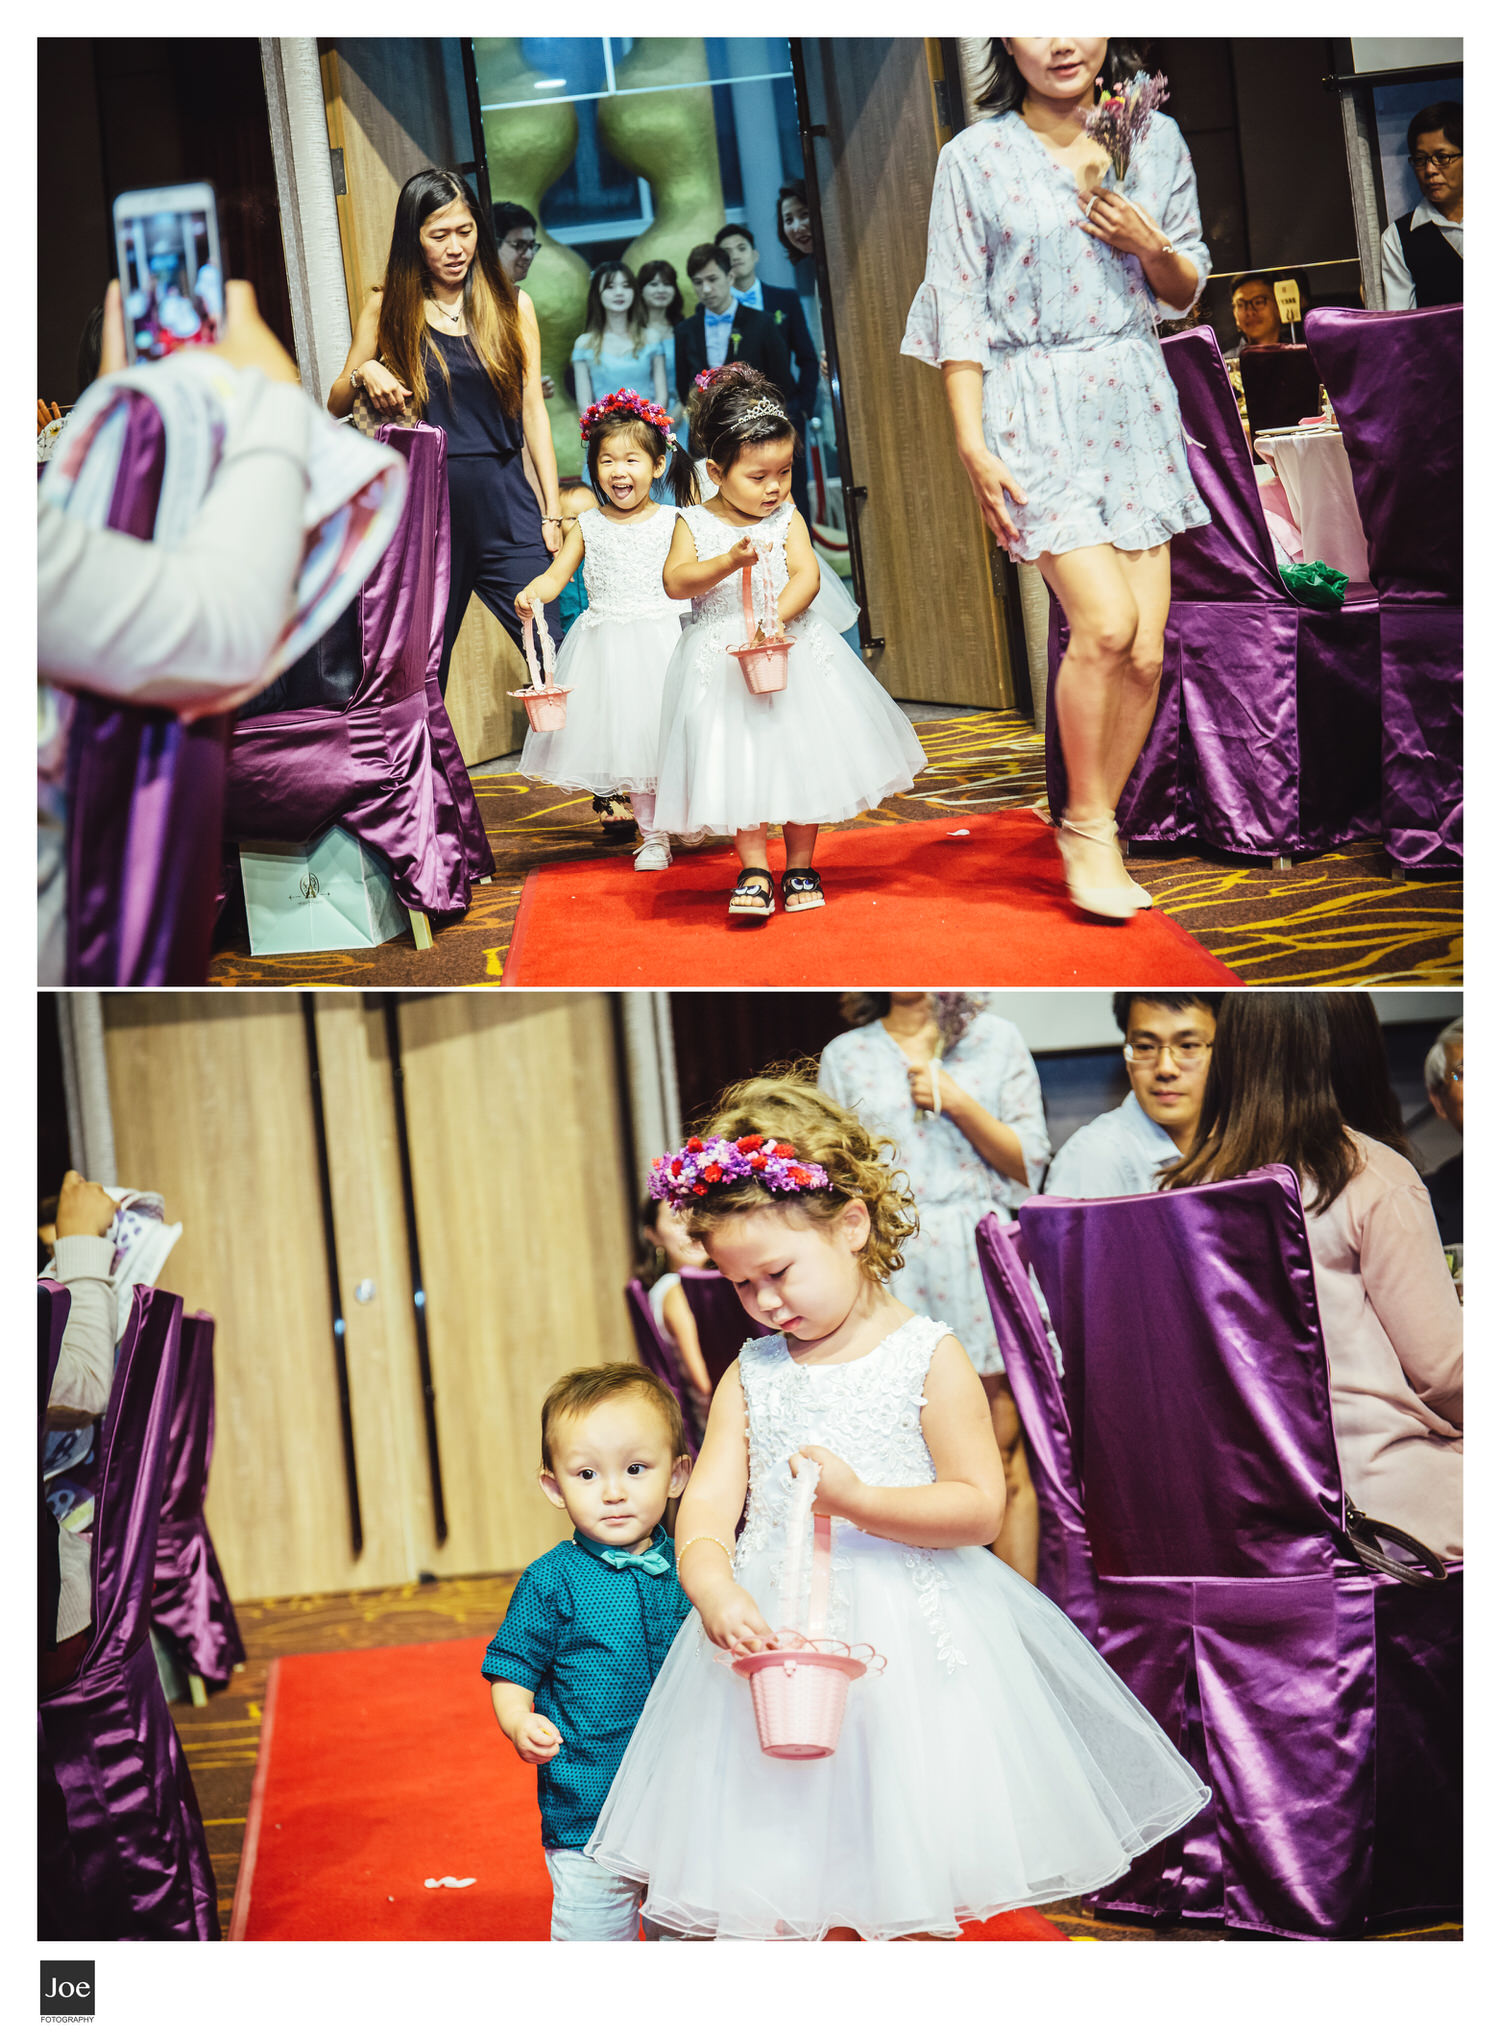 jc-olivia-wedding-86-liyan-banquet-hall-joe-fotography.jpg